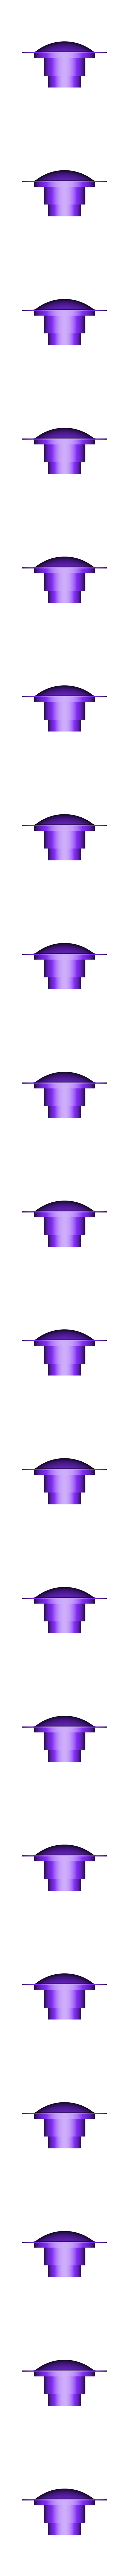 Pièce 6.STL Download STL file Translocator Sombra • 3D print model, Midnight_05